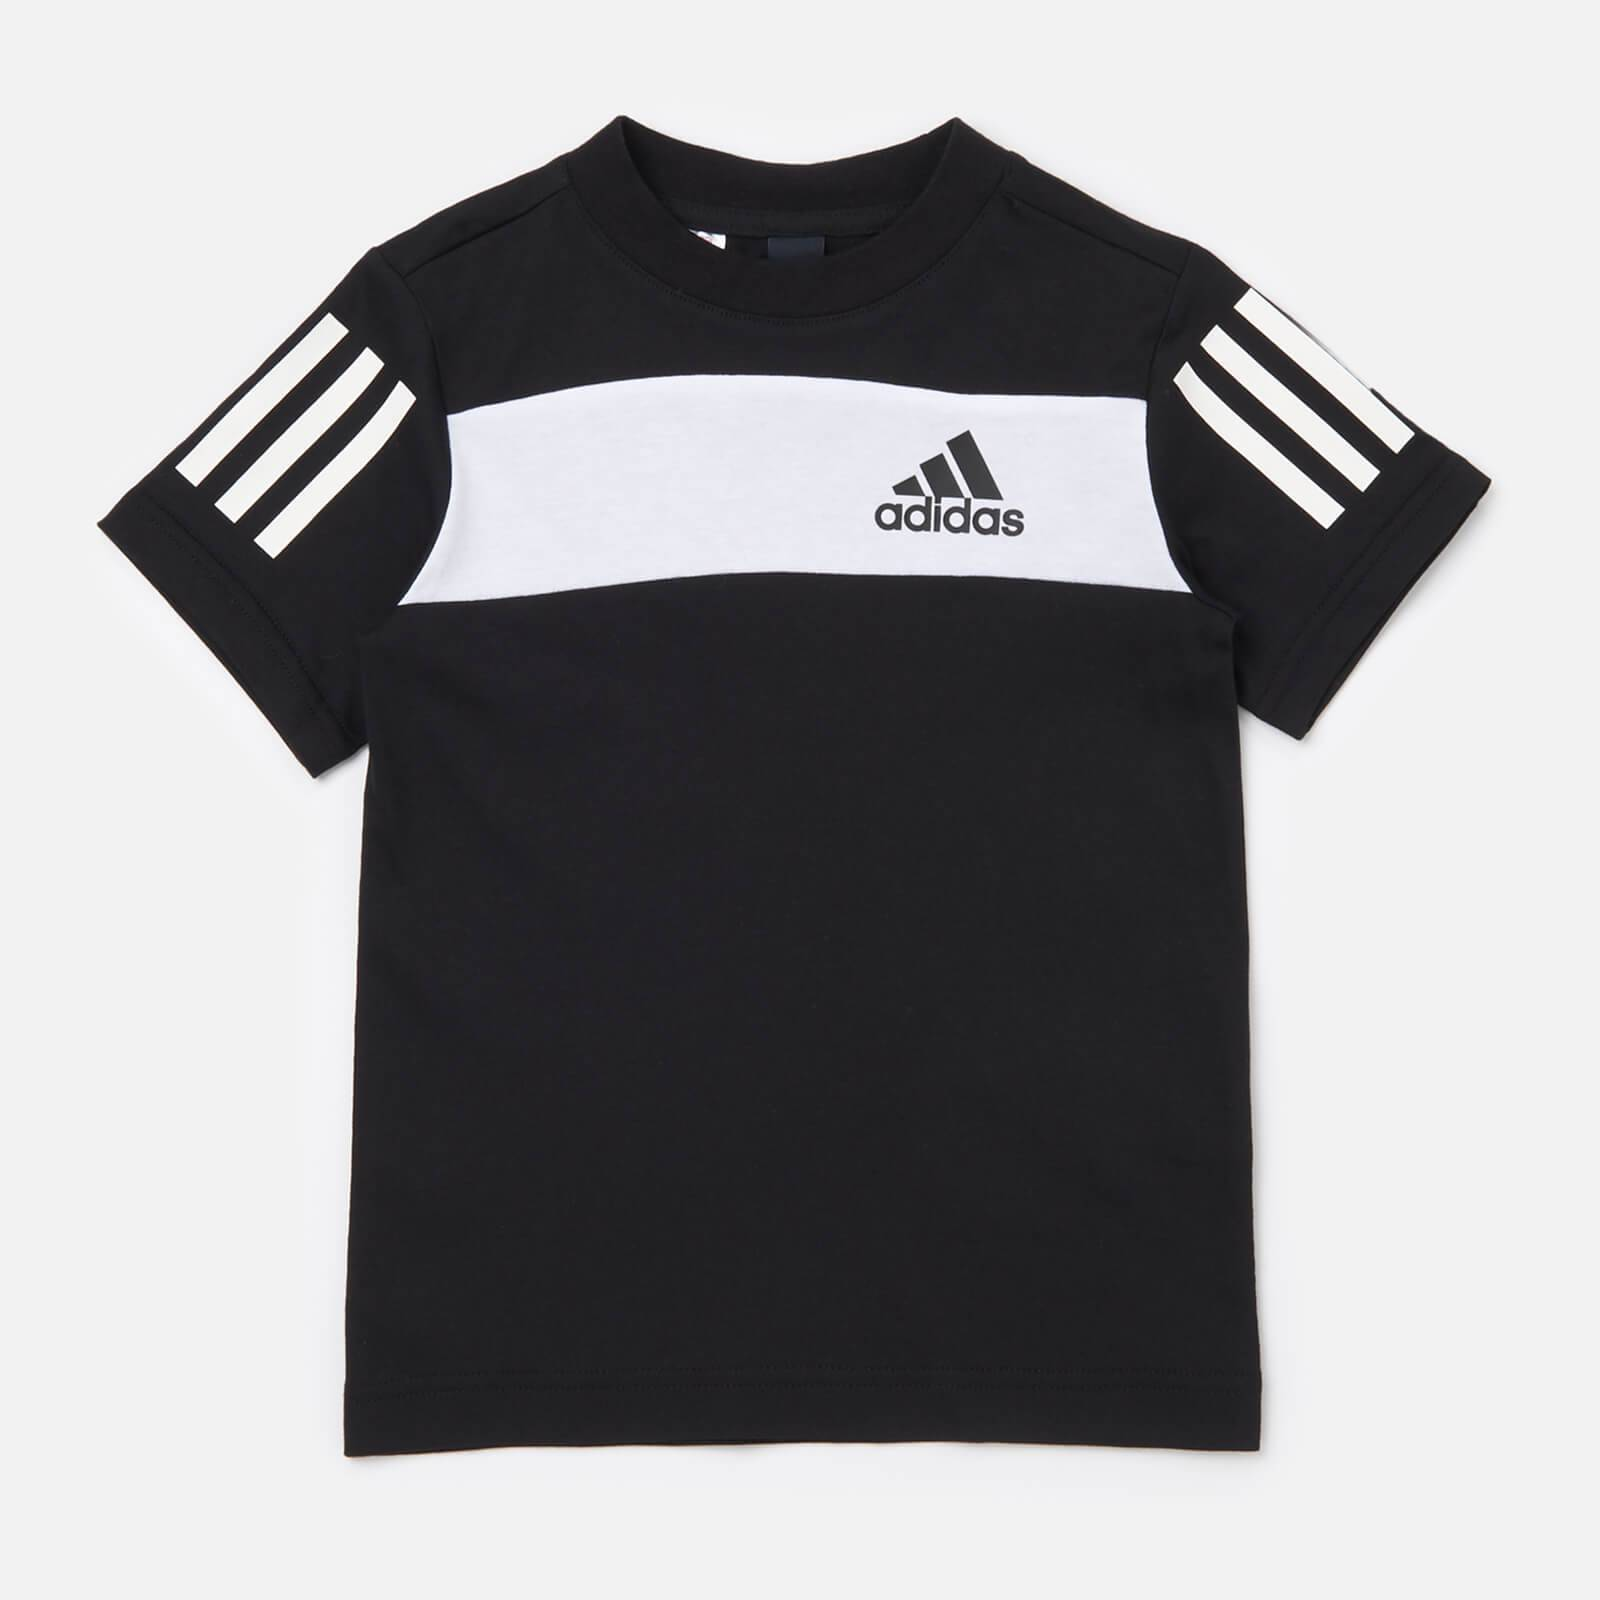 adidas Boys' Young Boys Sid T-Shirt - Black - 9-10 Years